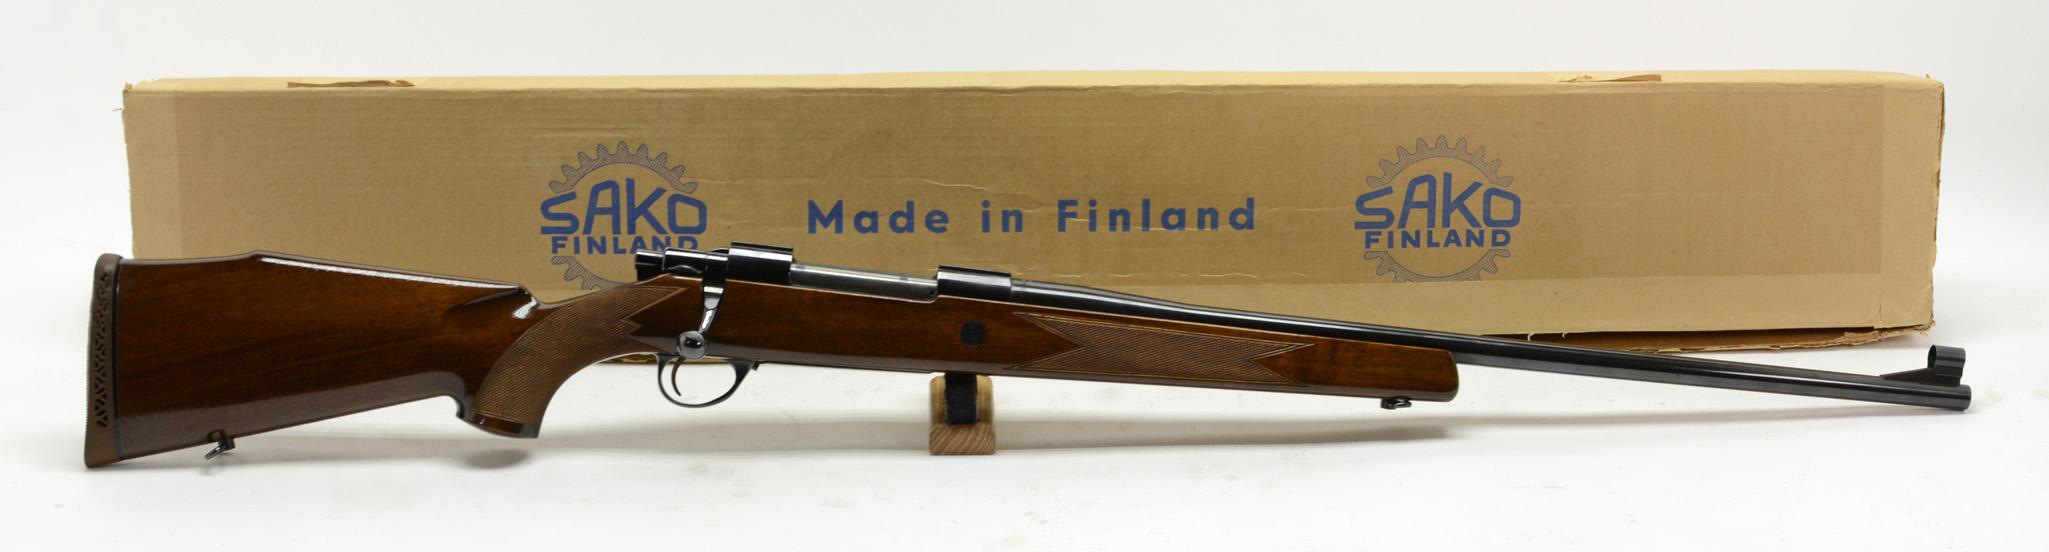 Sako L61R Finnbear 300 Win Mag